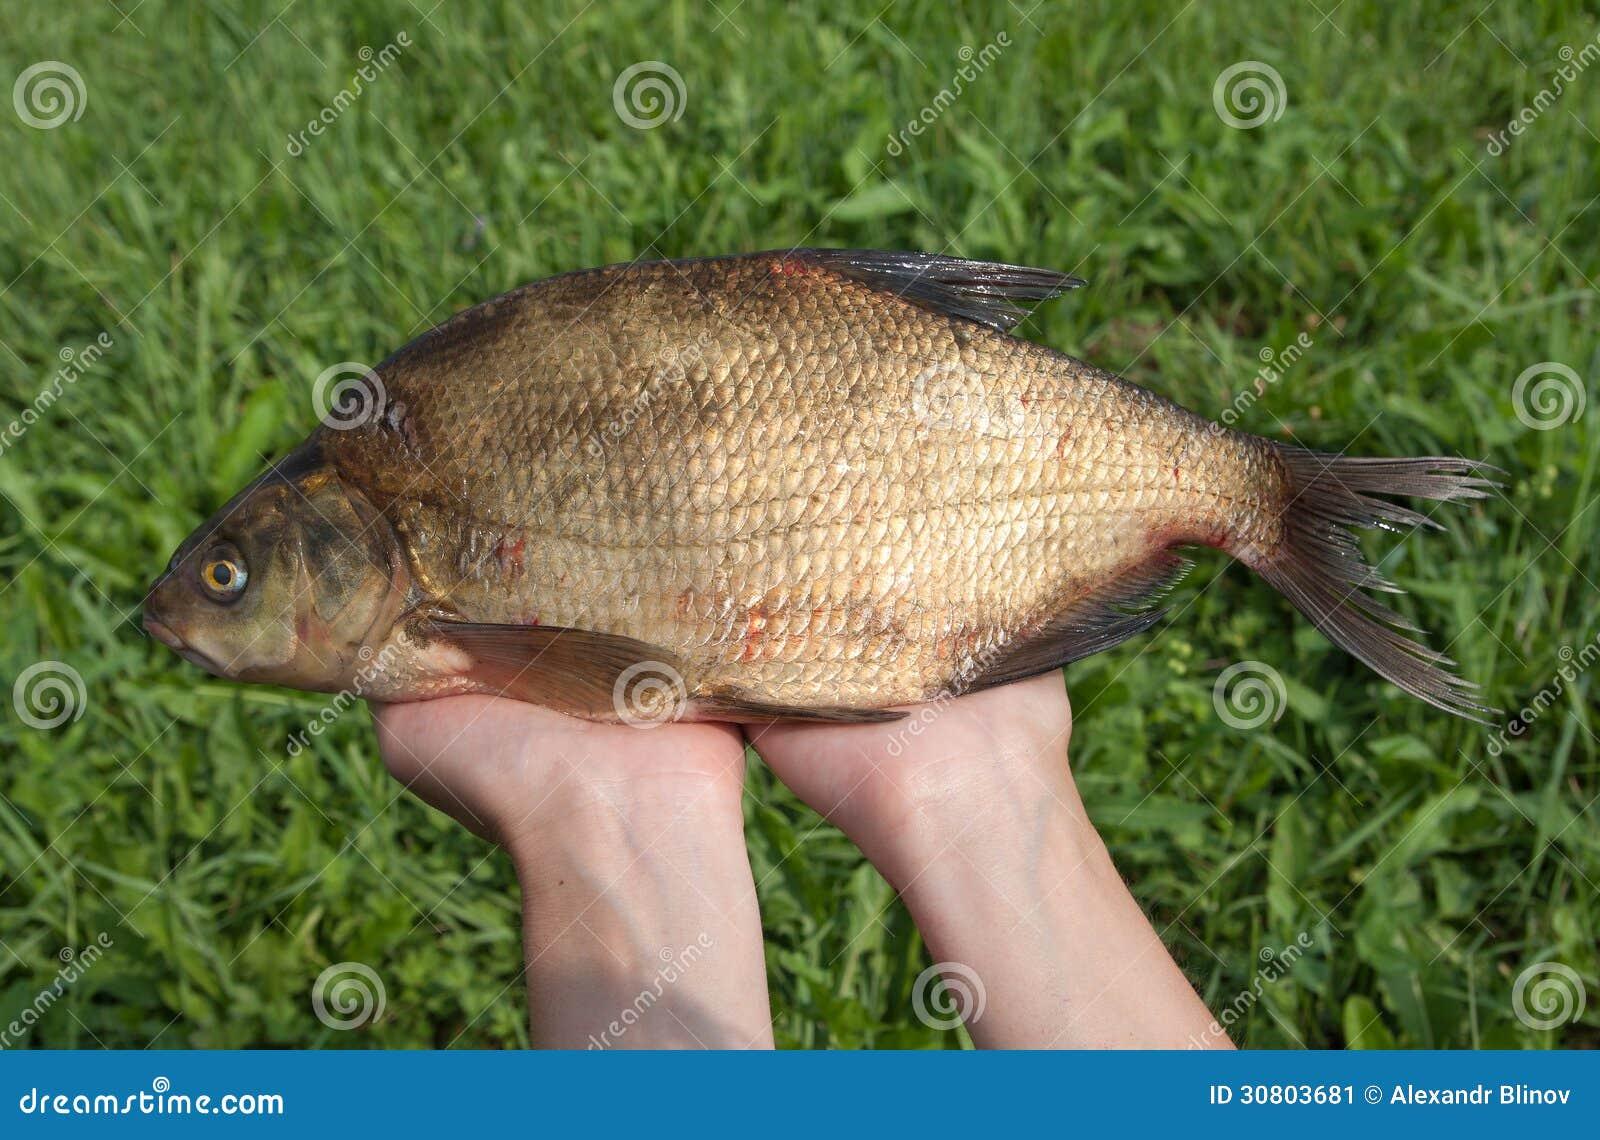 Freshwater fish bream - Large Freshwater Bream